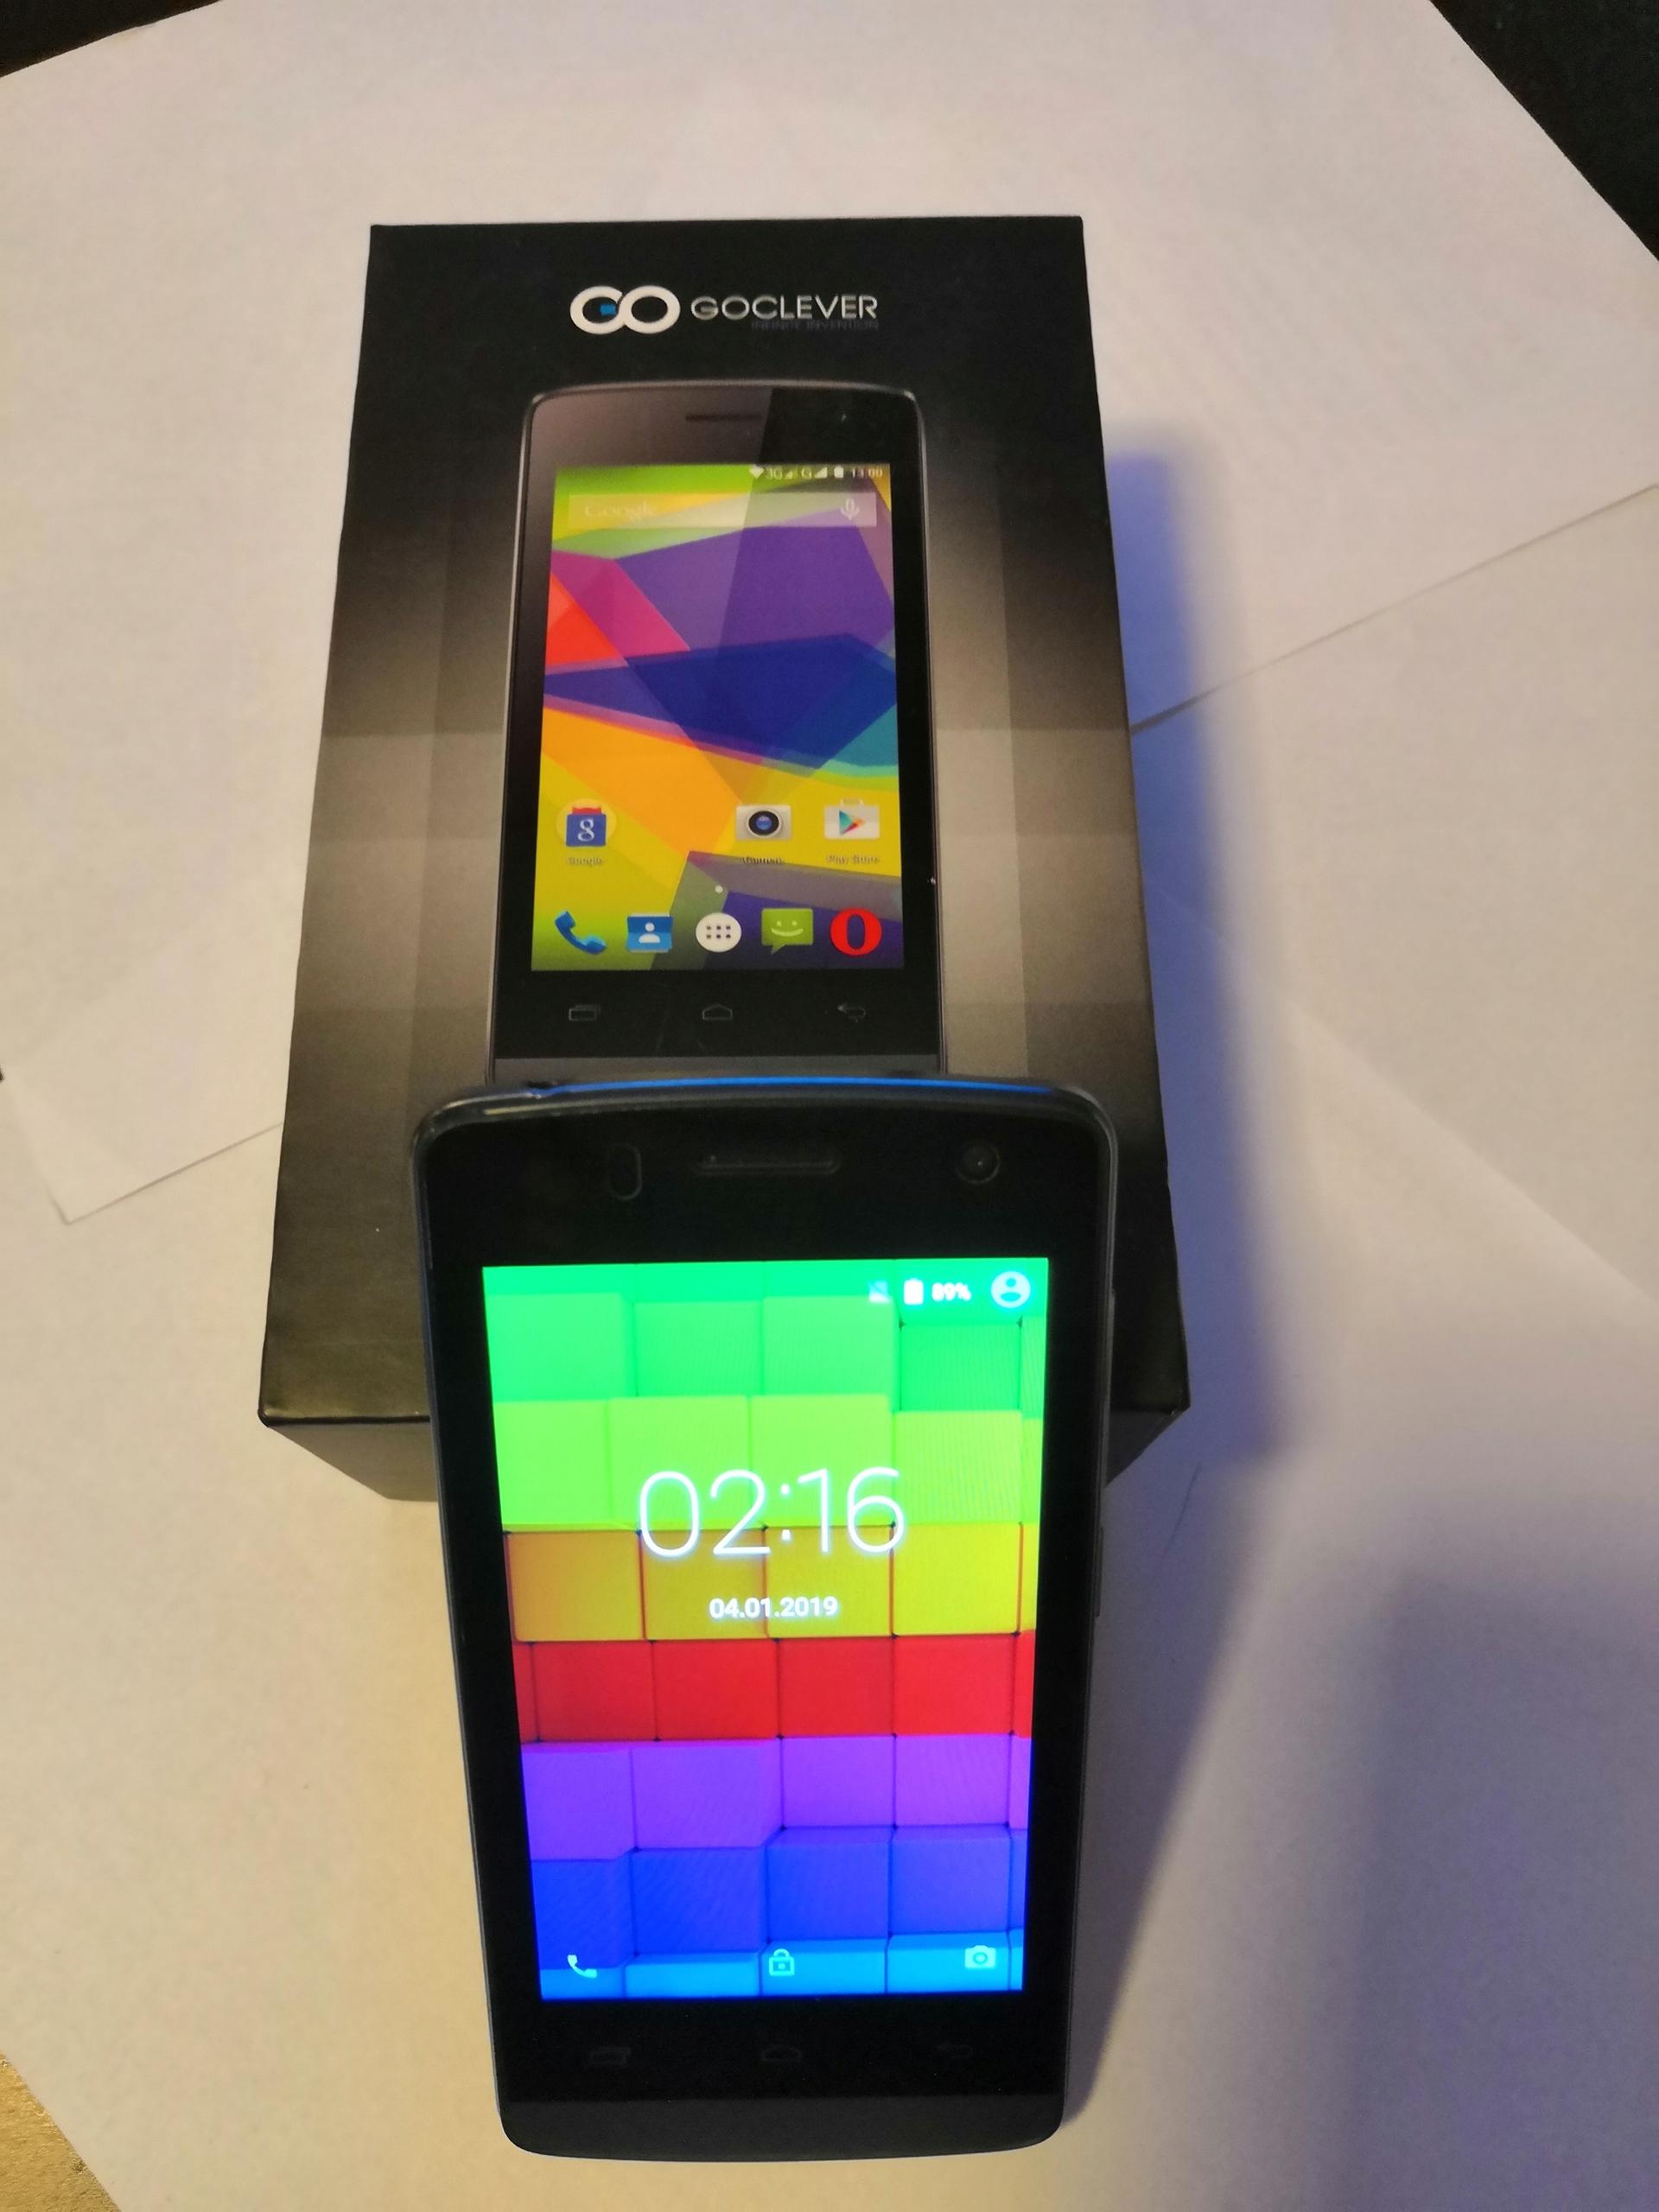 GOCLEVER QUANTUM 2 400S telefon komórka smartfon